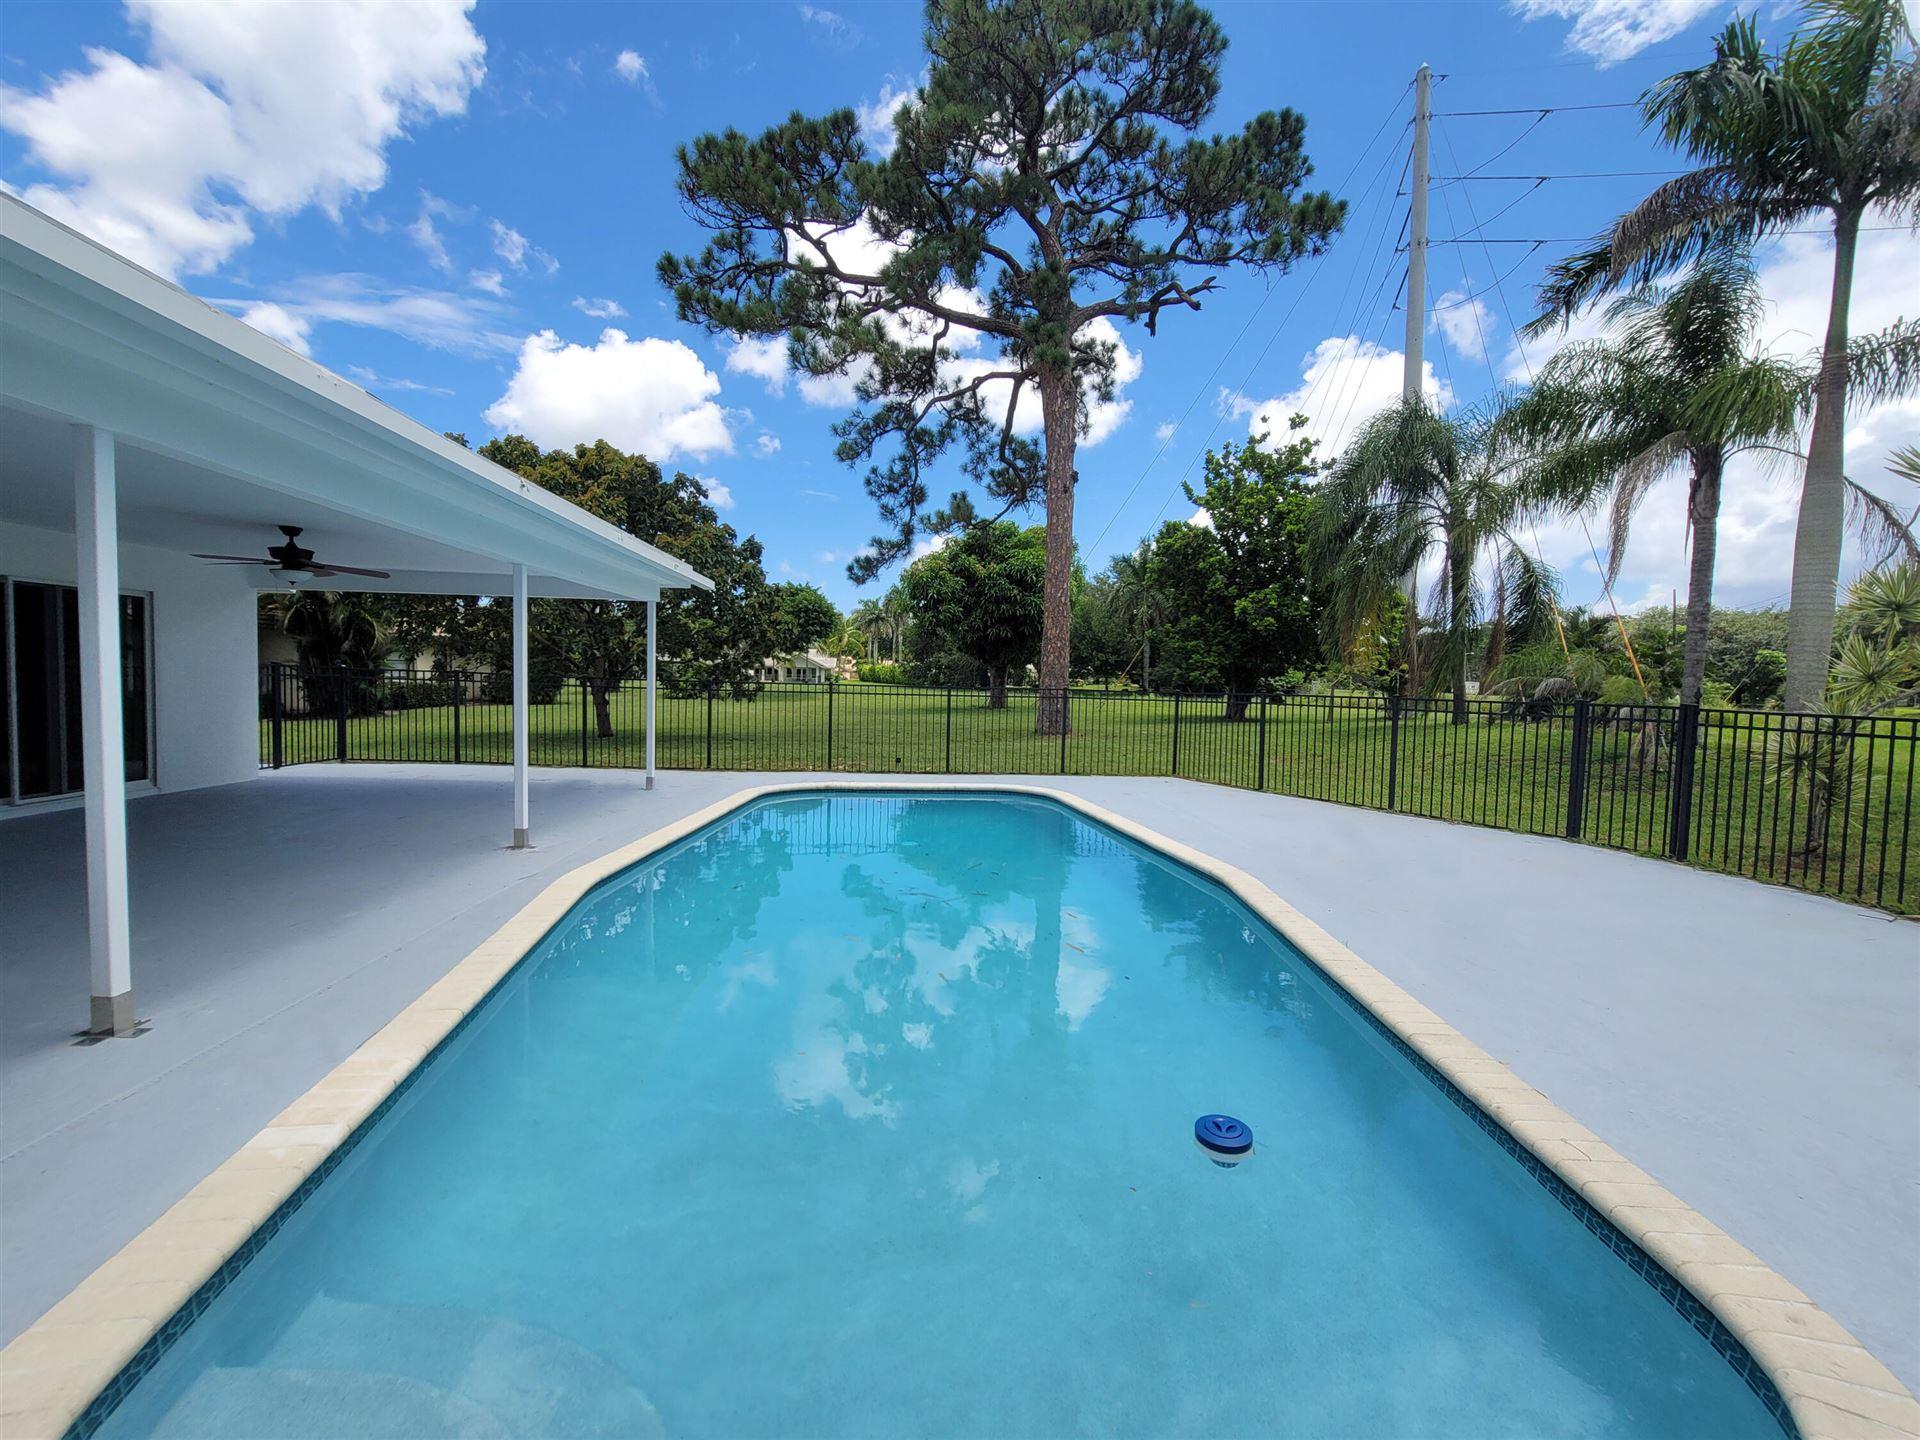 Photo of 2334 NW Timbercreek Circle, Boca Raton, FL 33431 (MLS # RX-10746297)